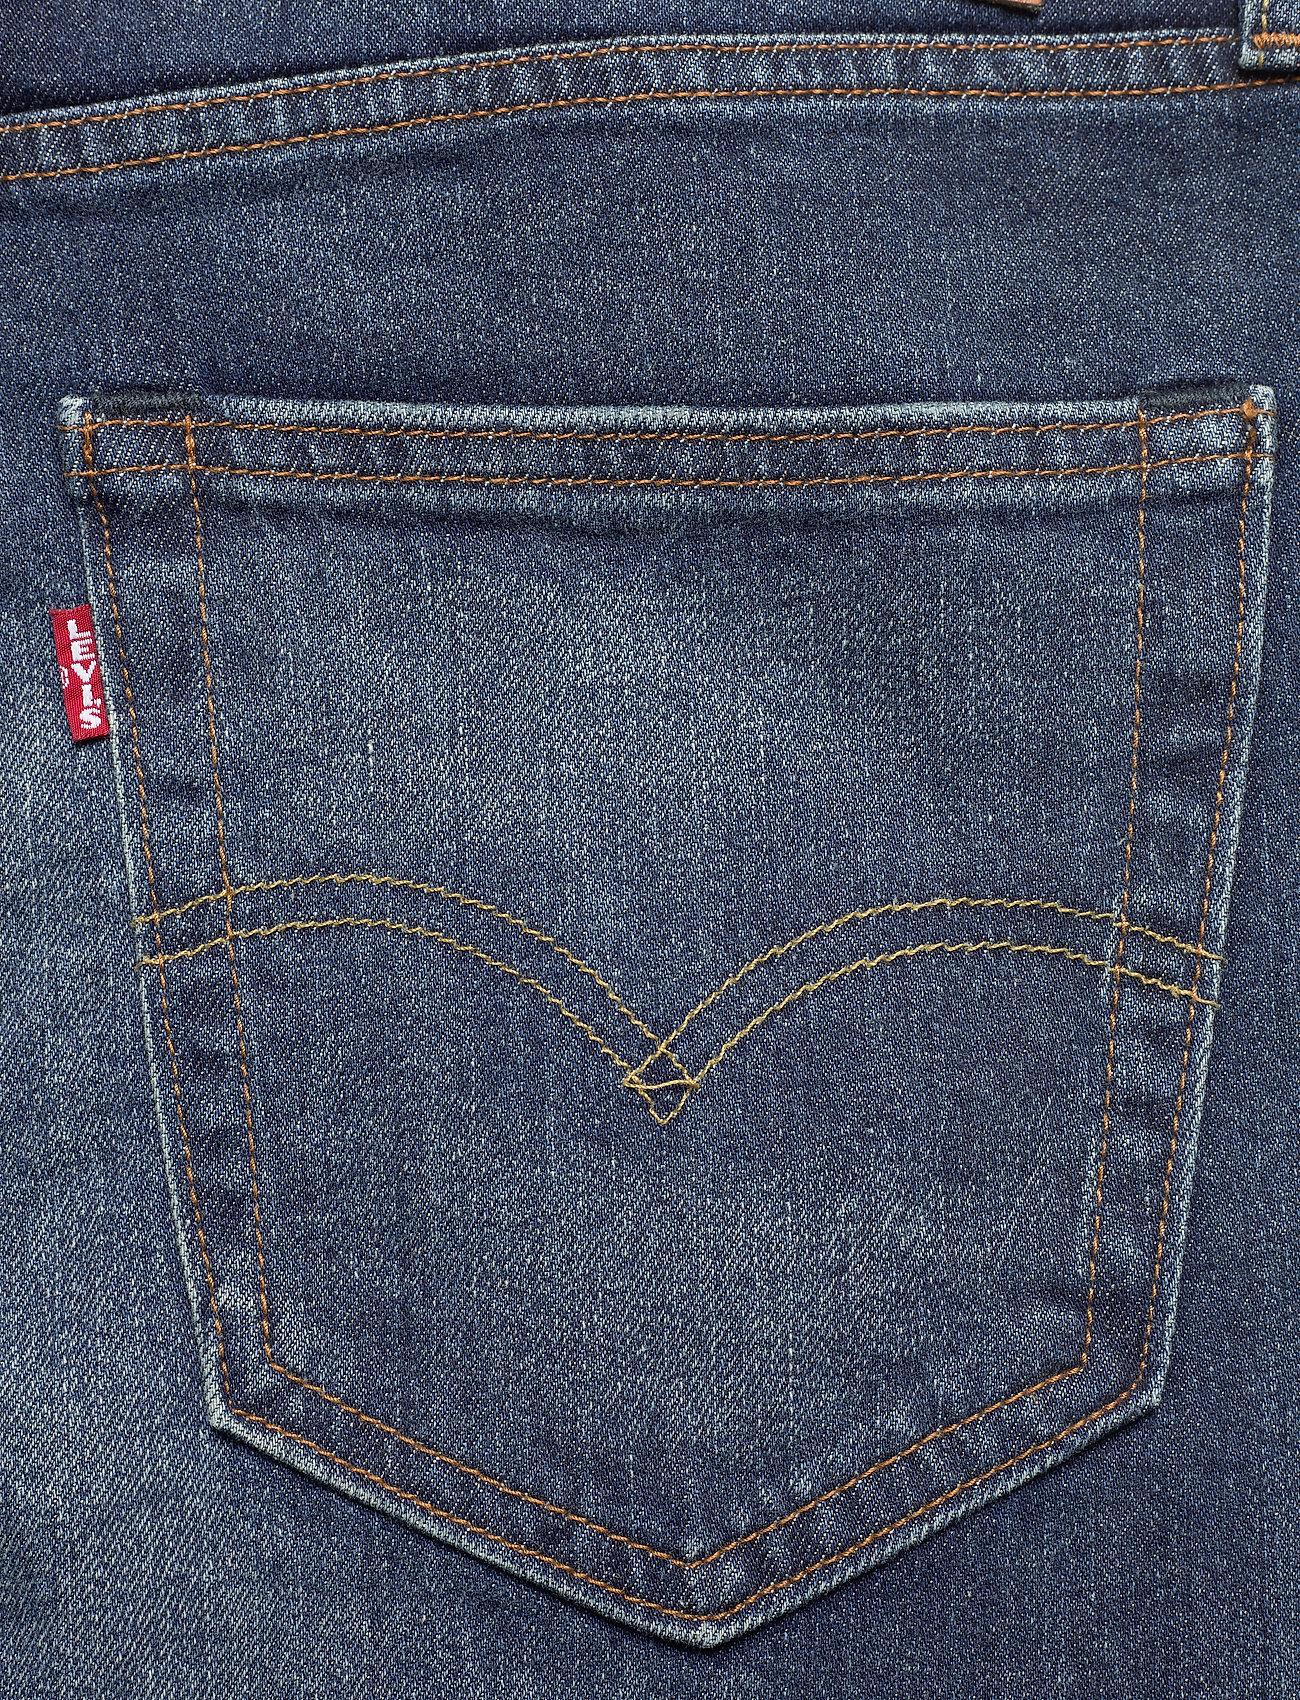 LEVI´S Men 512 SLIM TAPER RED RED JUICE A - Jeans DARK INDIGO - WORN IN - Menn Klær